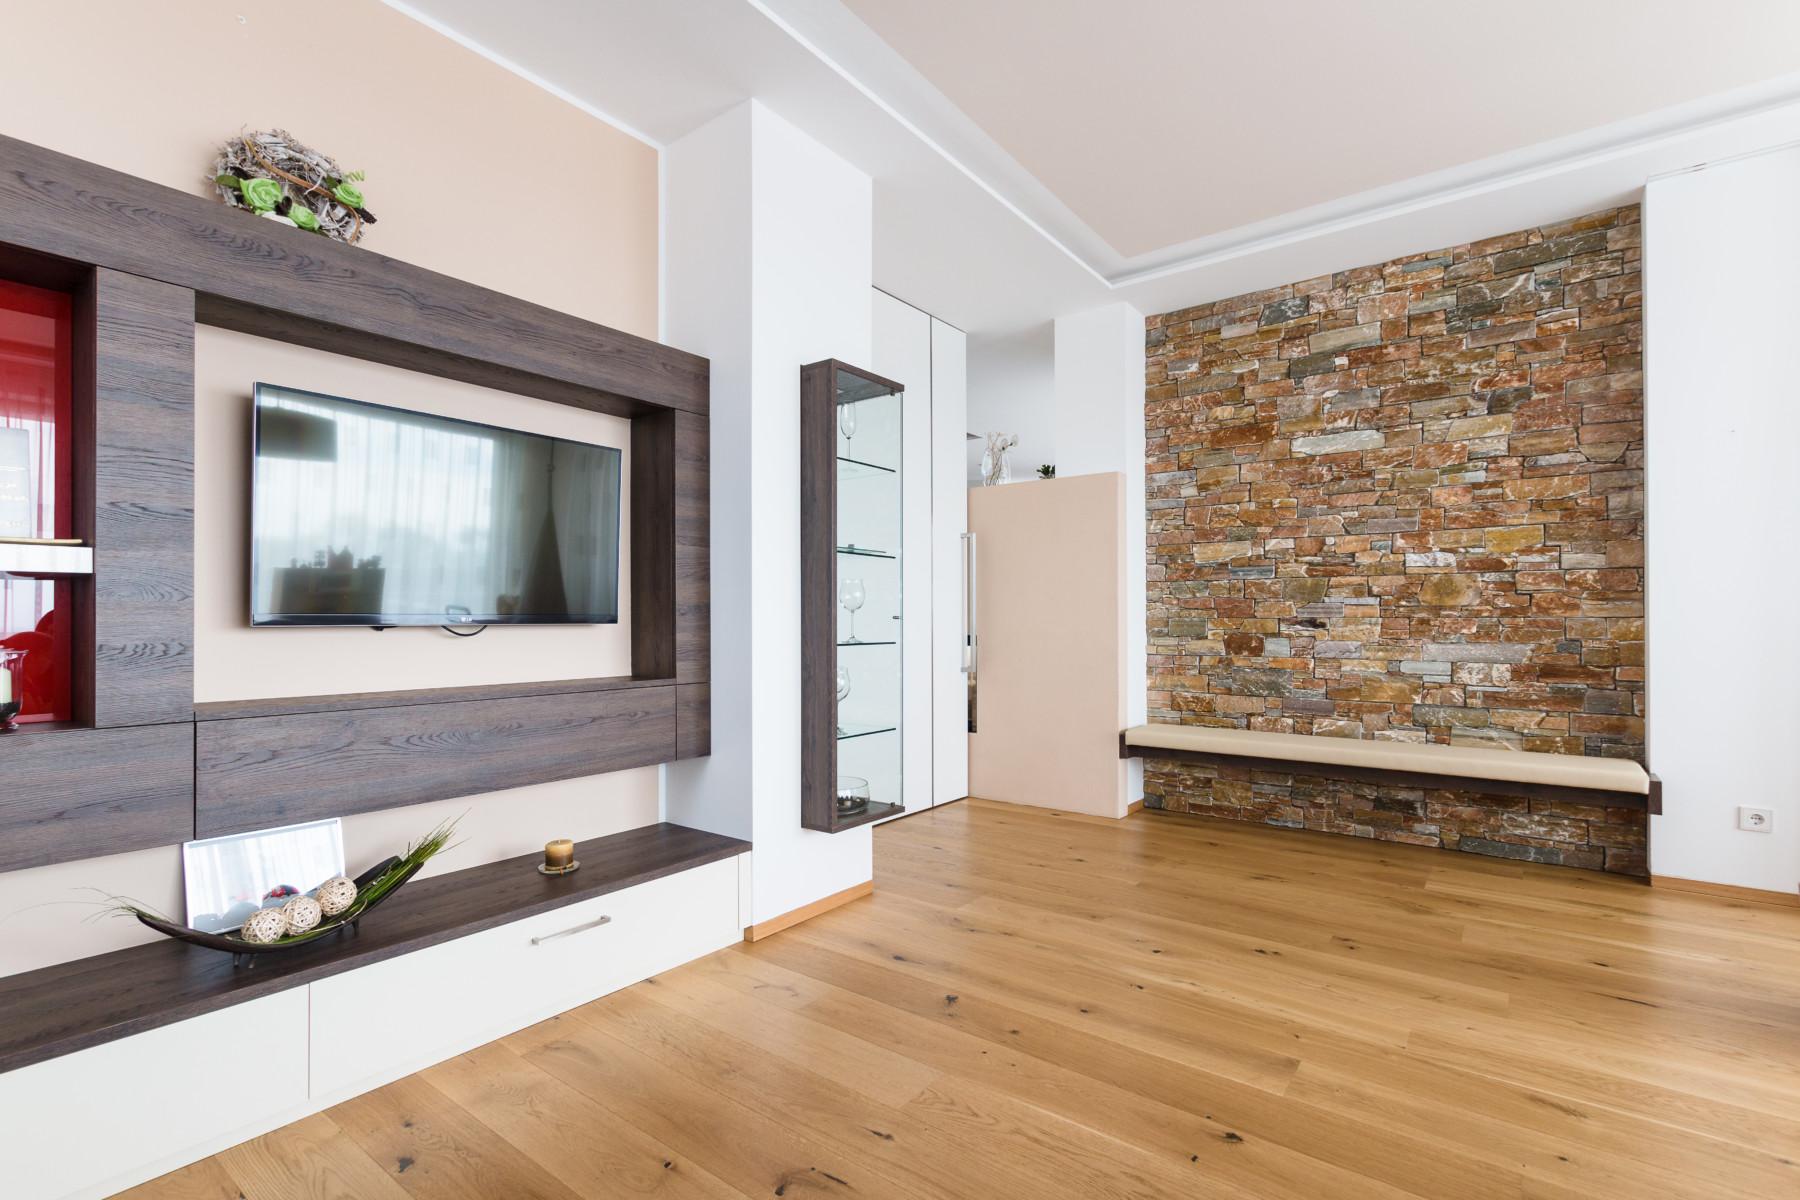 wohnen pecherstorfer pecherstorfer. Black Bedroom Furniture Sets. Home Design Ideas